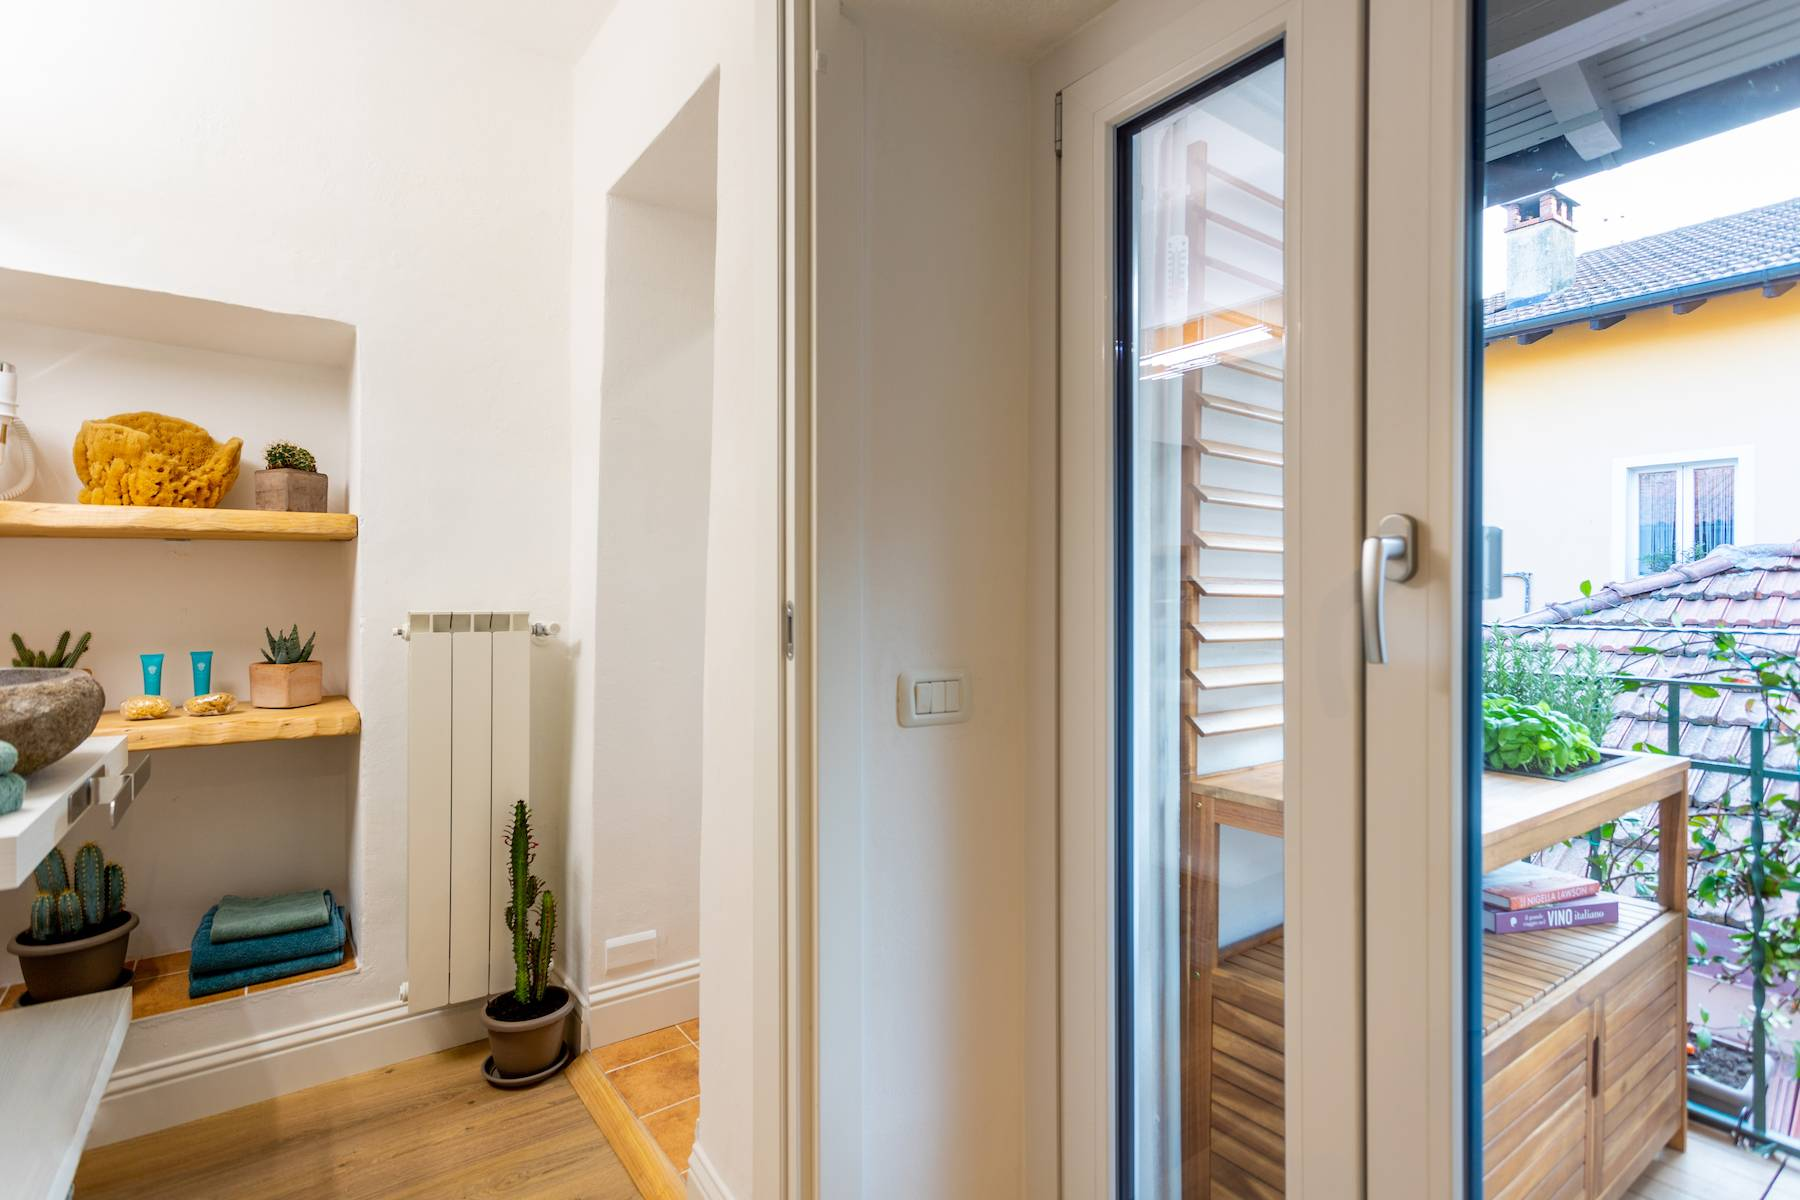 Appartamento in Vendita a Belgirate: 3 locali, 62 mq - Foto 20